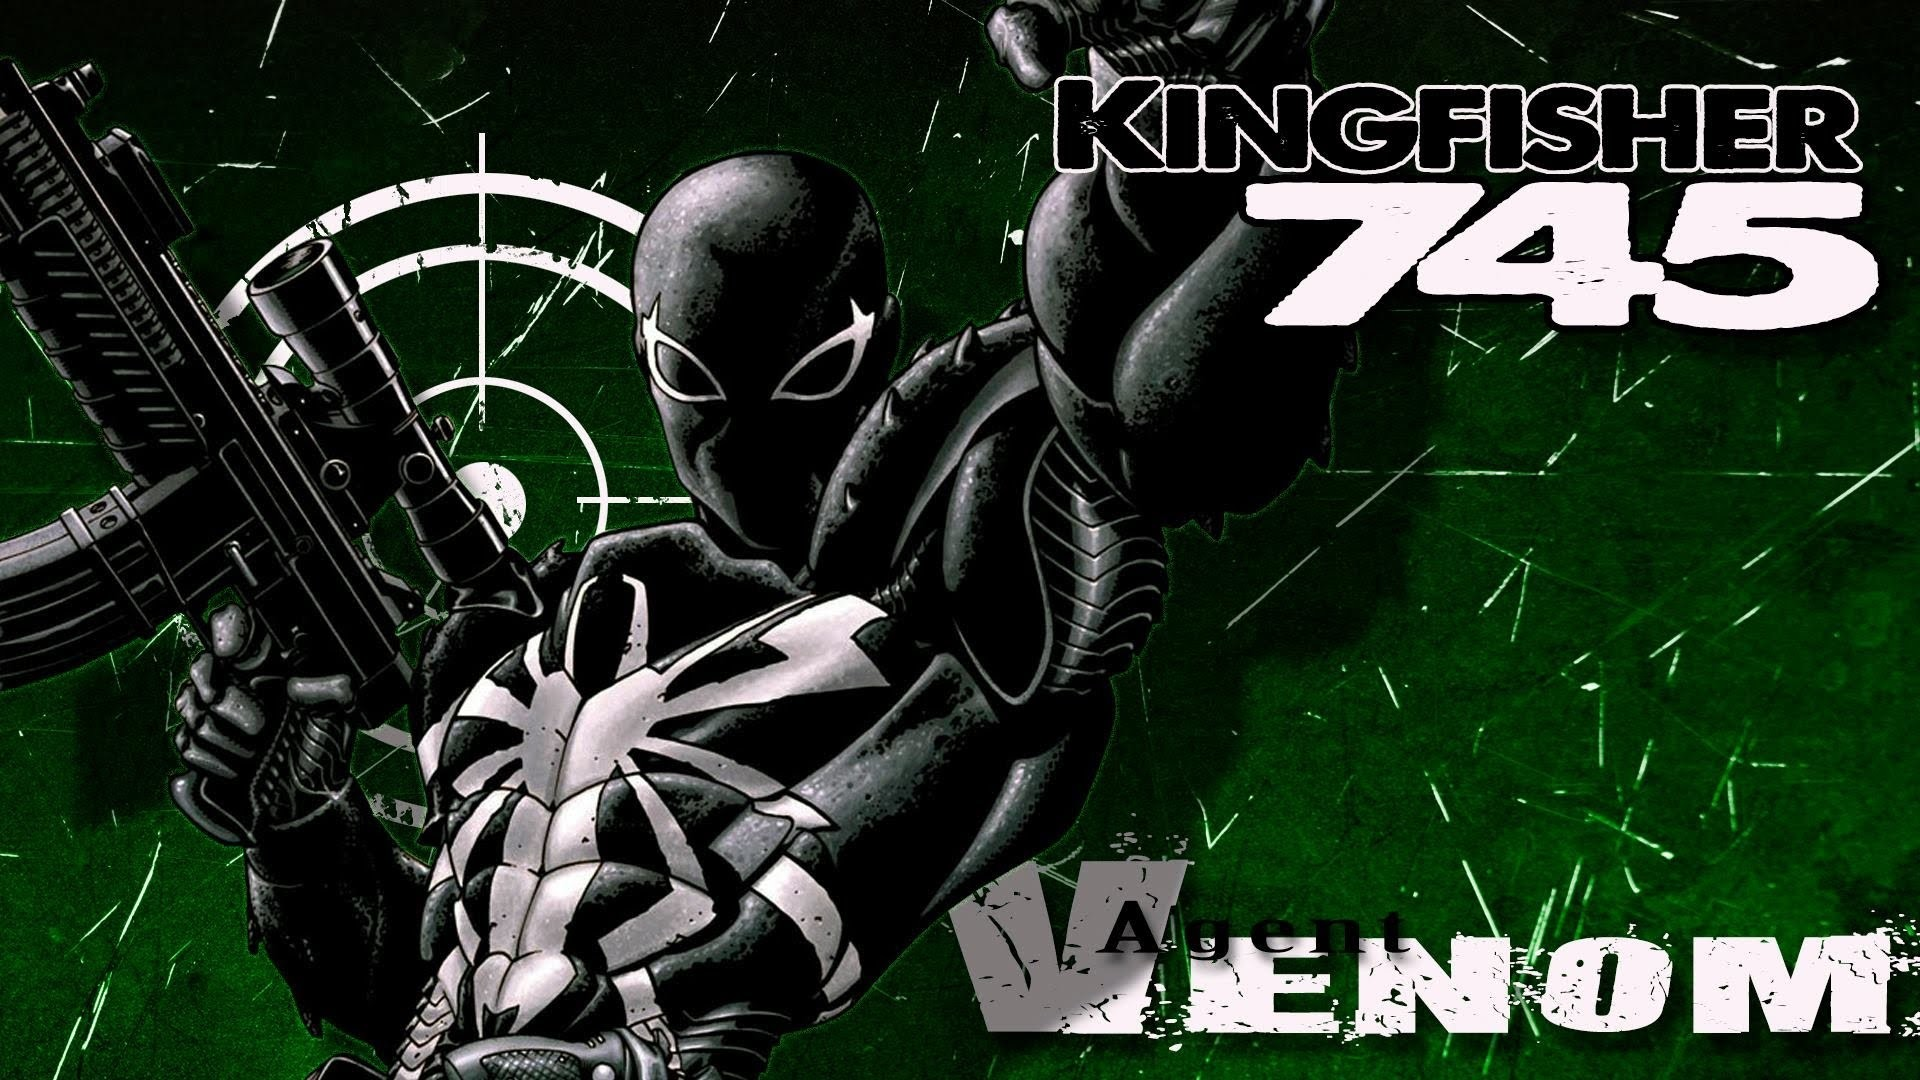 Marvel Avengers Alliance: Agent Venom PvP Gameplay at Level 7 – YouTube